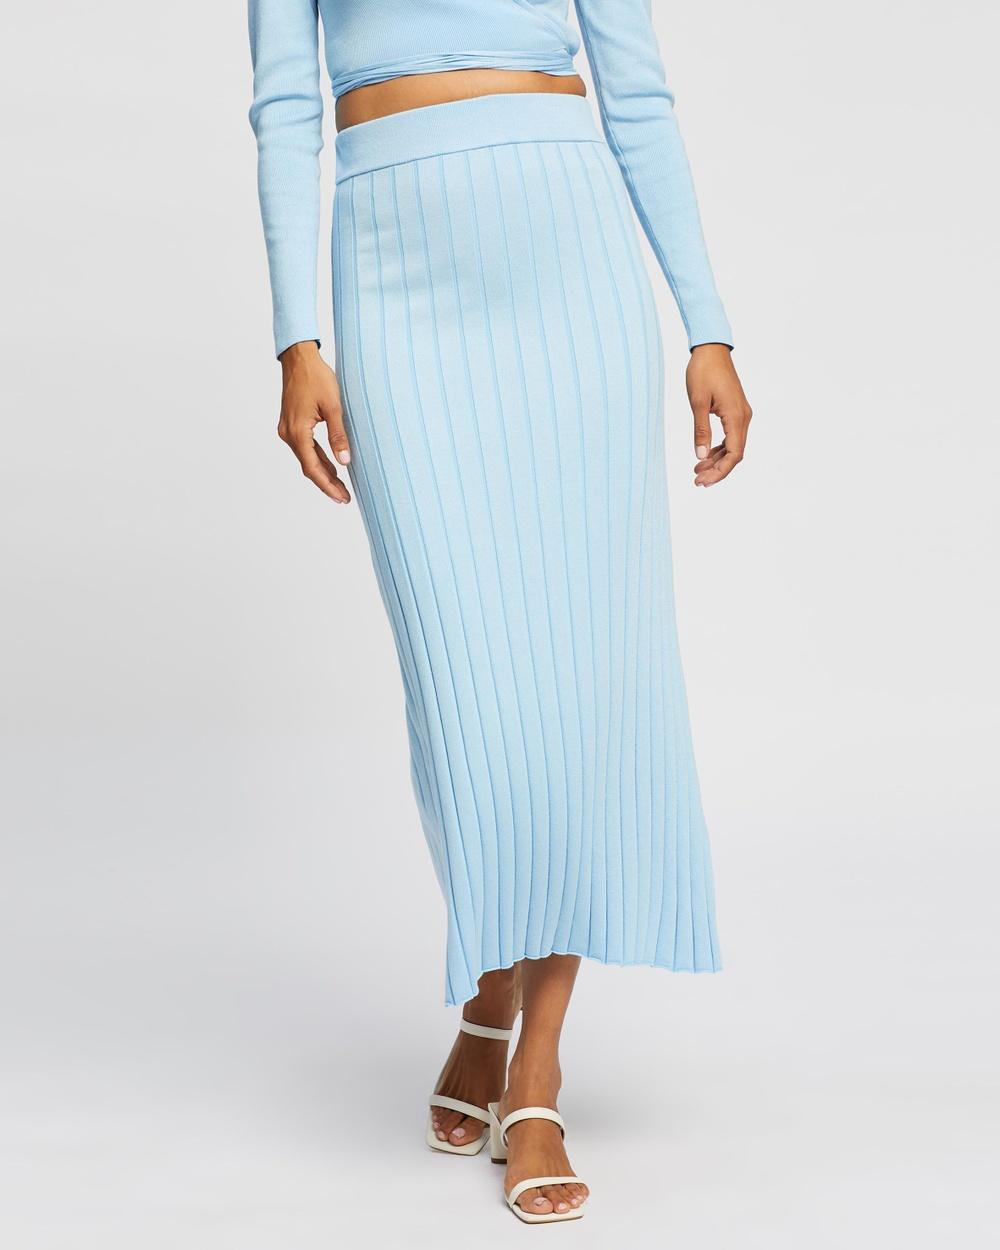 AERE Knit Skirt Pleated skirts Blue